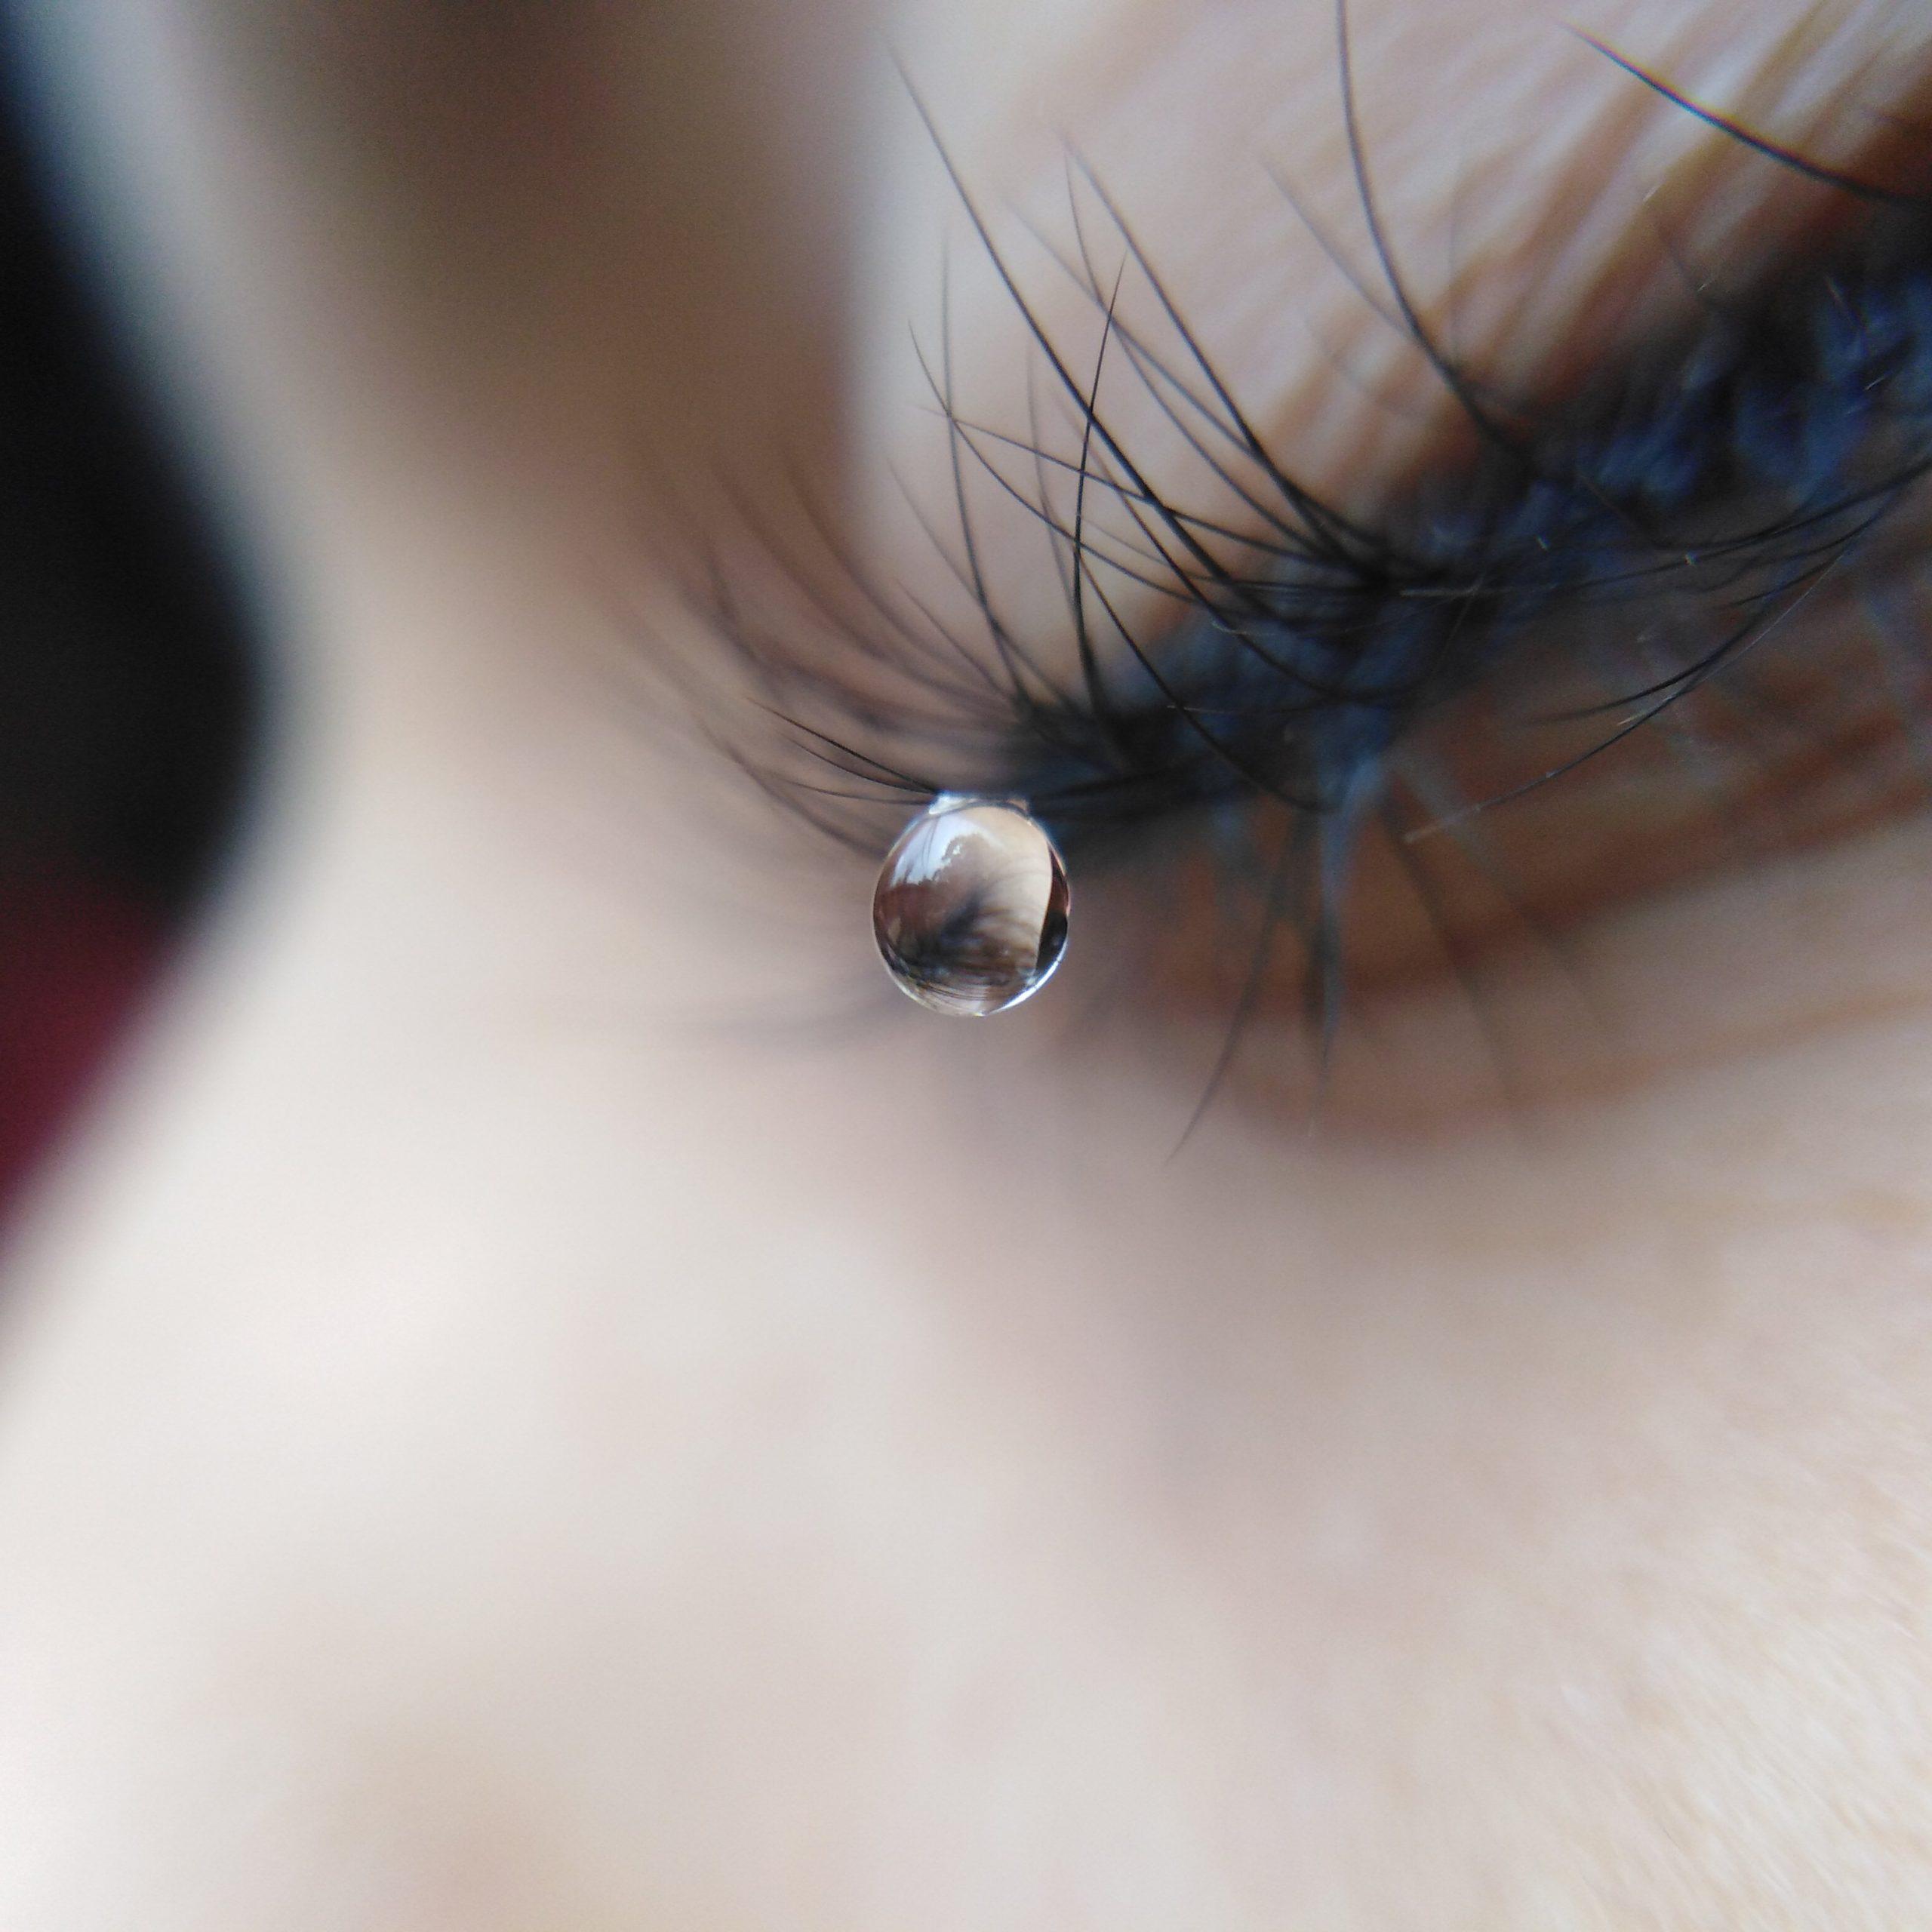 Drop on eye